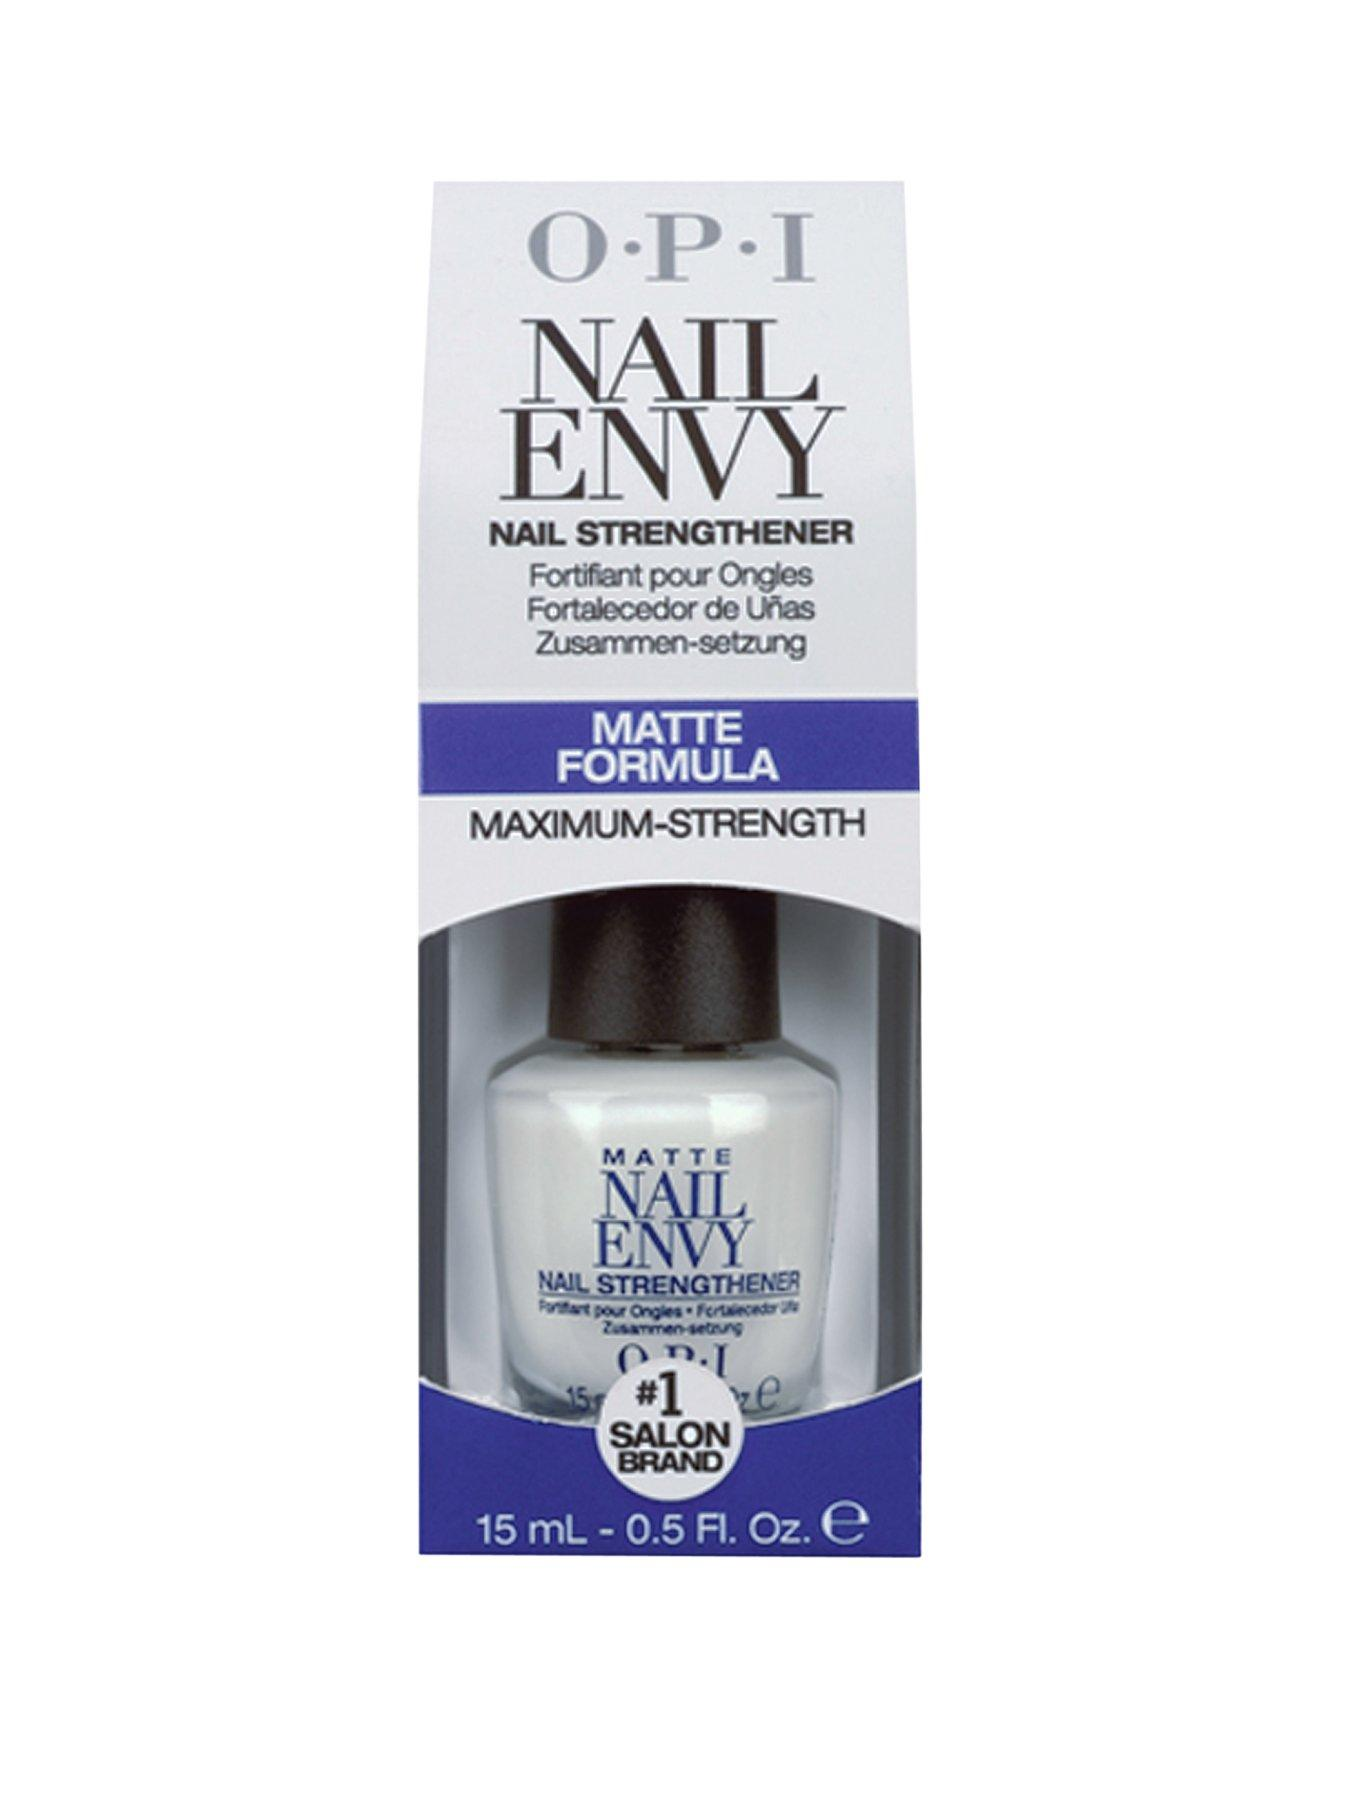 OPI Nail Polish - Matte Nail Envy